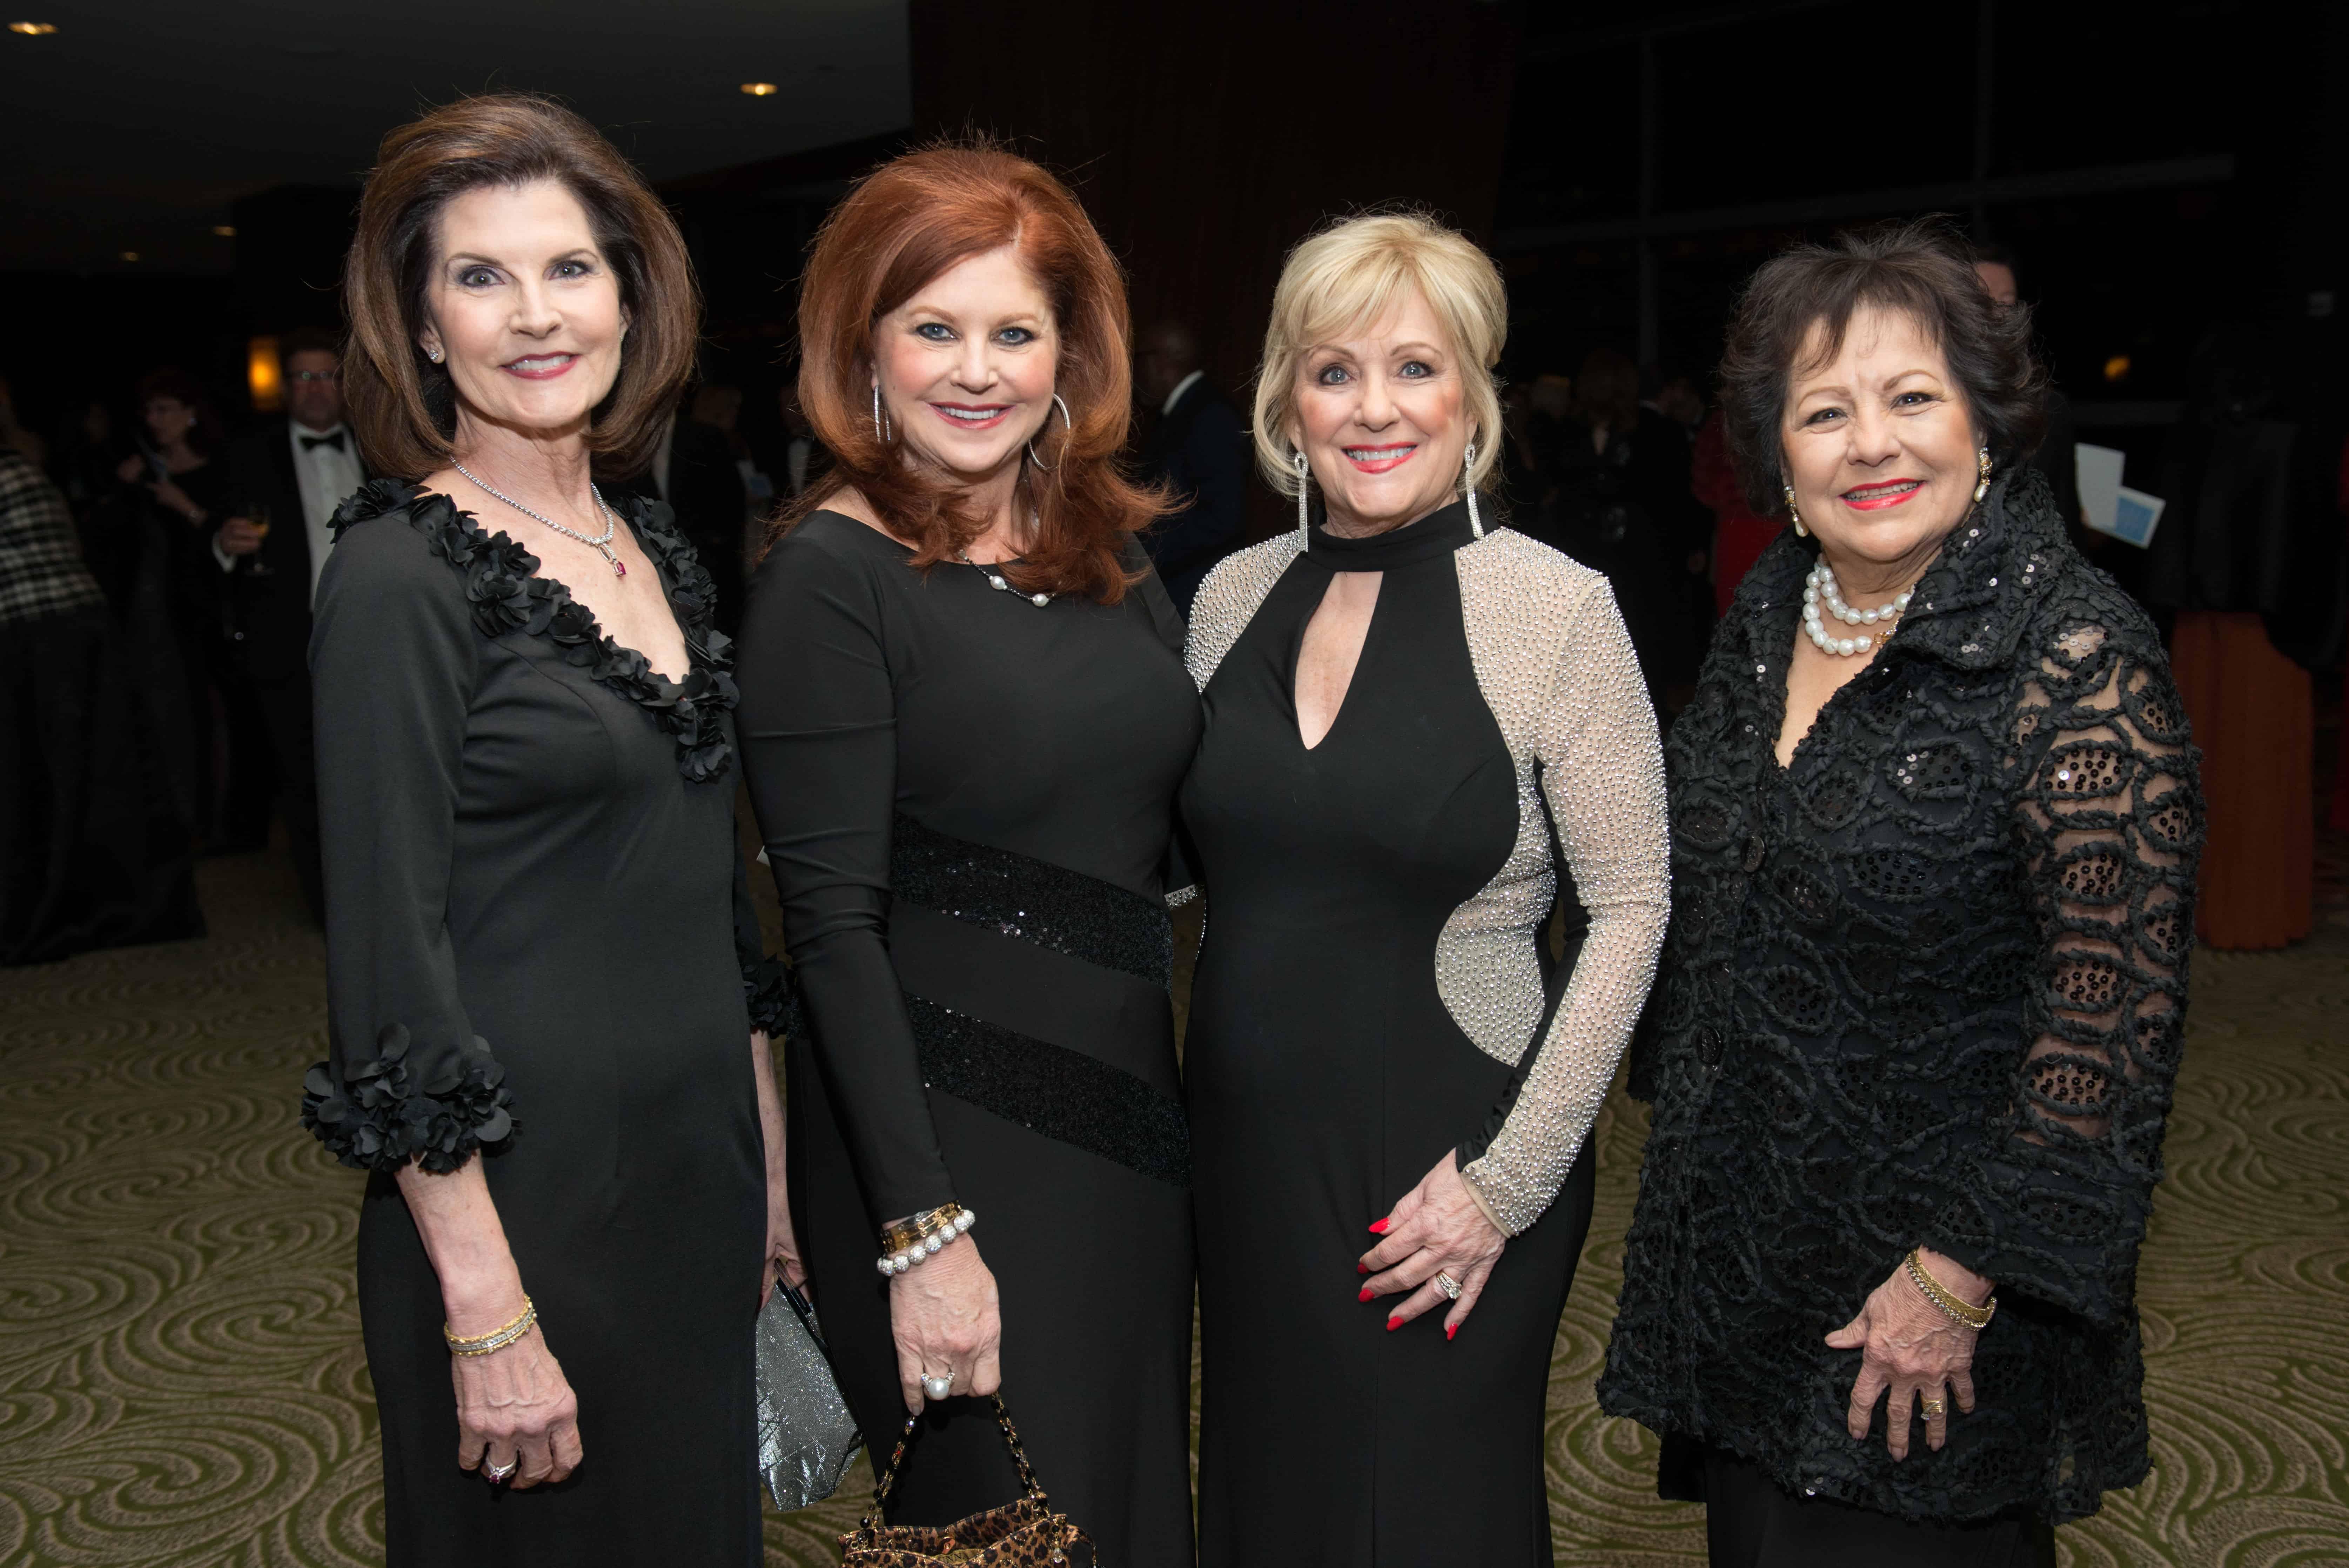 Jane Brann, Laura Kent, Pam Springer and Barbara Johnson